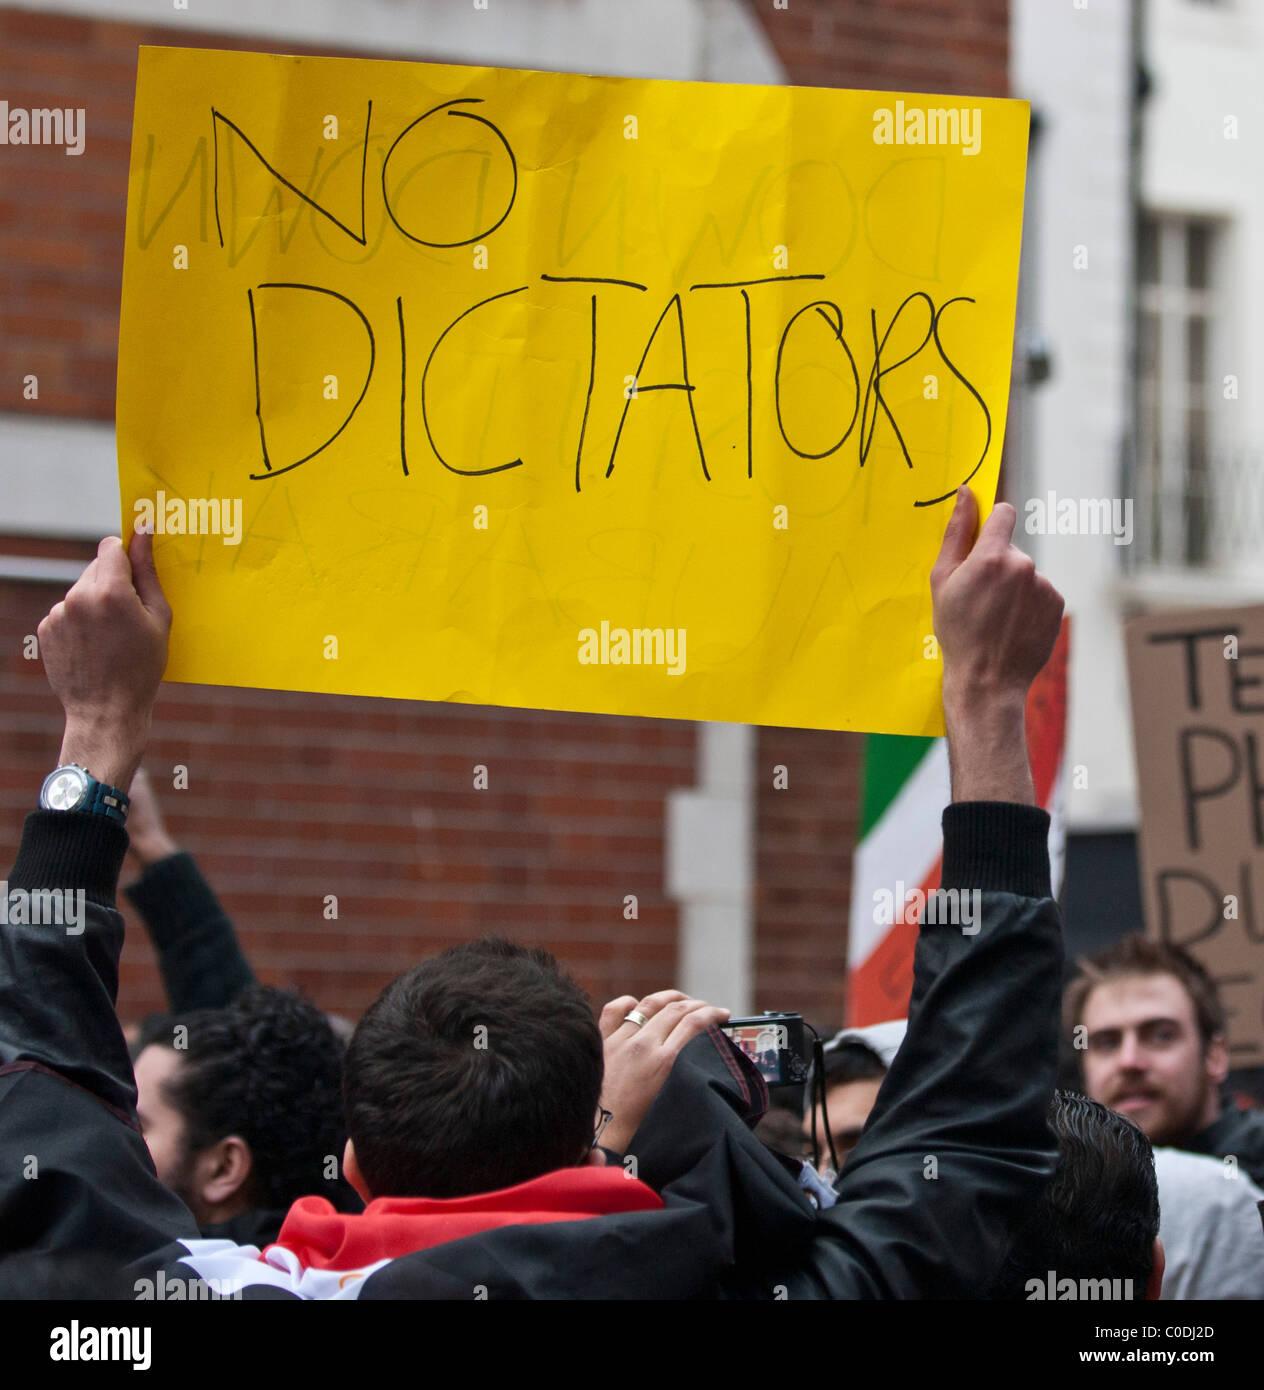 "Manifestante contra Hosni Mubarak sostiene pancarta diciendo 'no dictadores"" fuera de la Embajada egipcia Imagen De Stock"